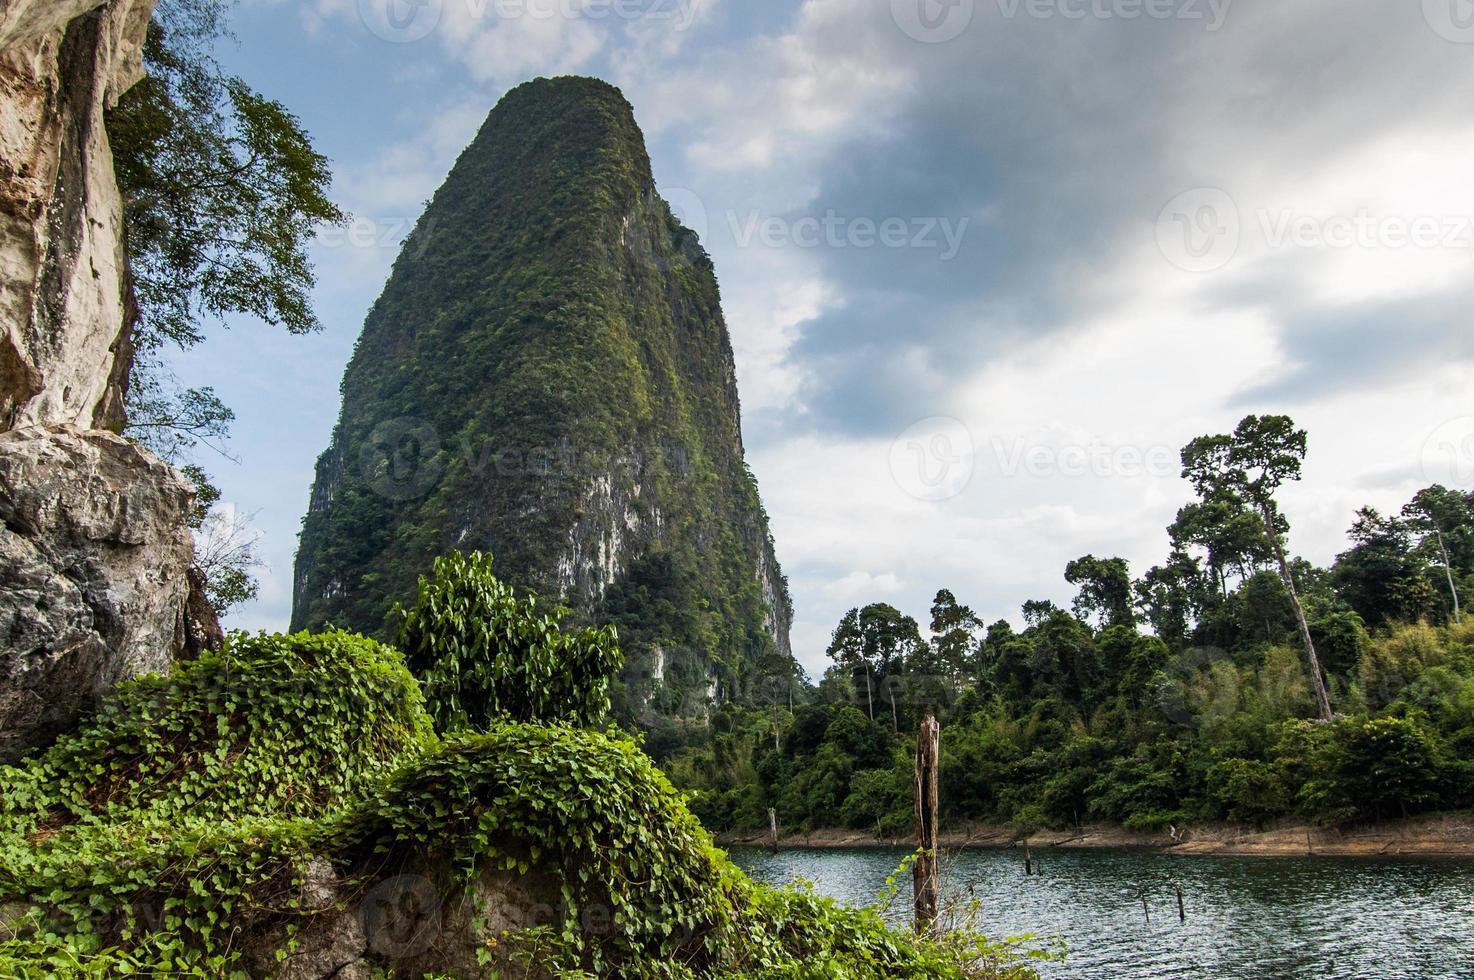 roccia gigante, parco nazionale di khao sok foto